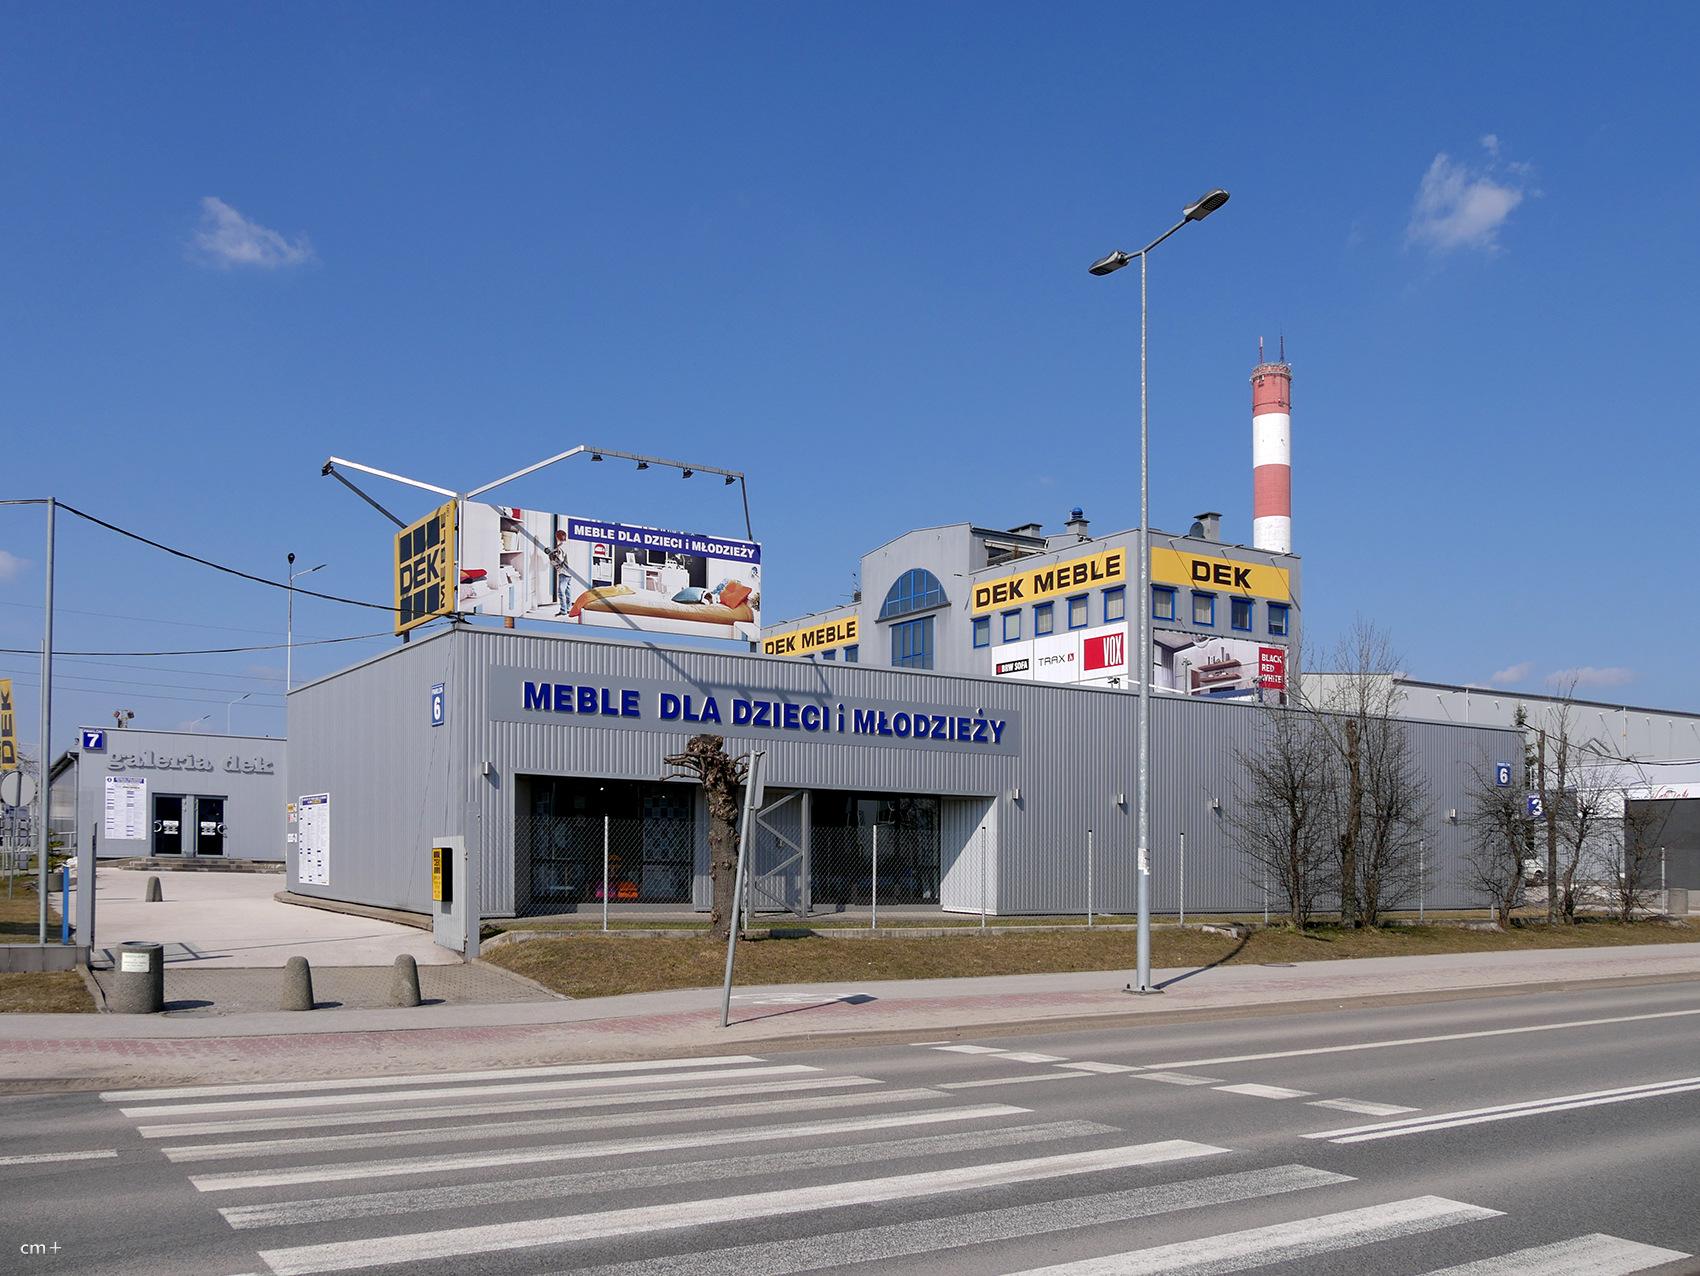 Centrum Handlowe Dek Meble Kielce Zdjęcia